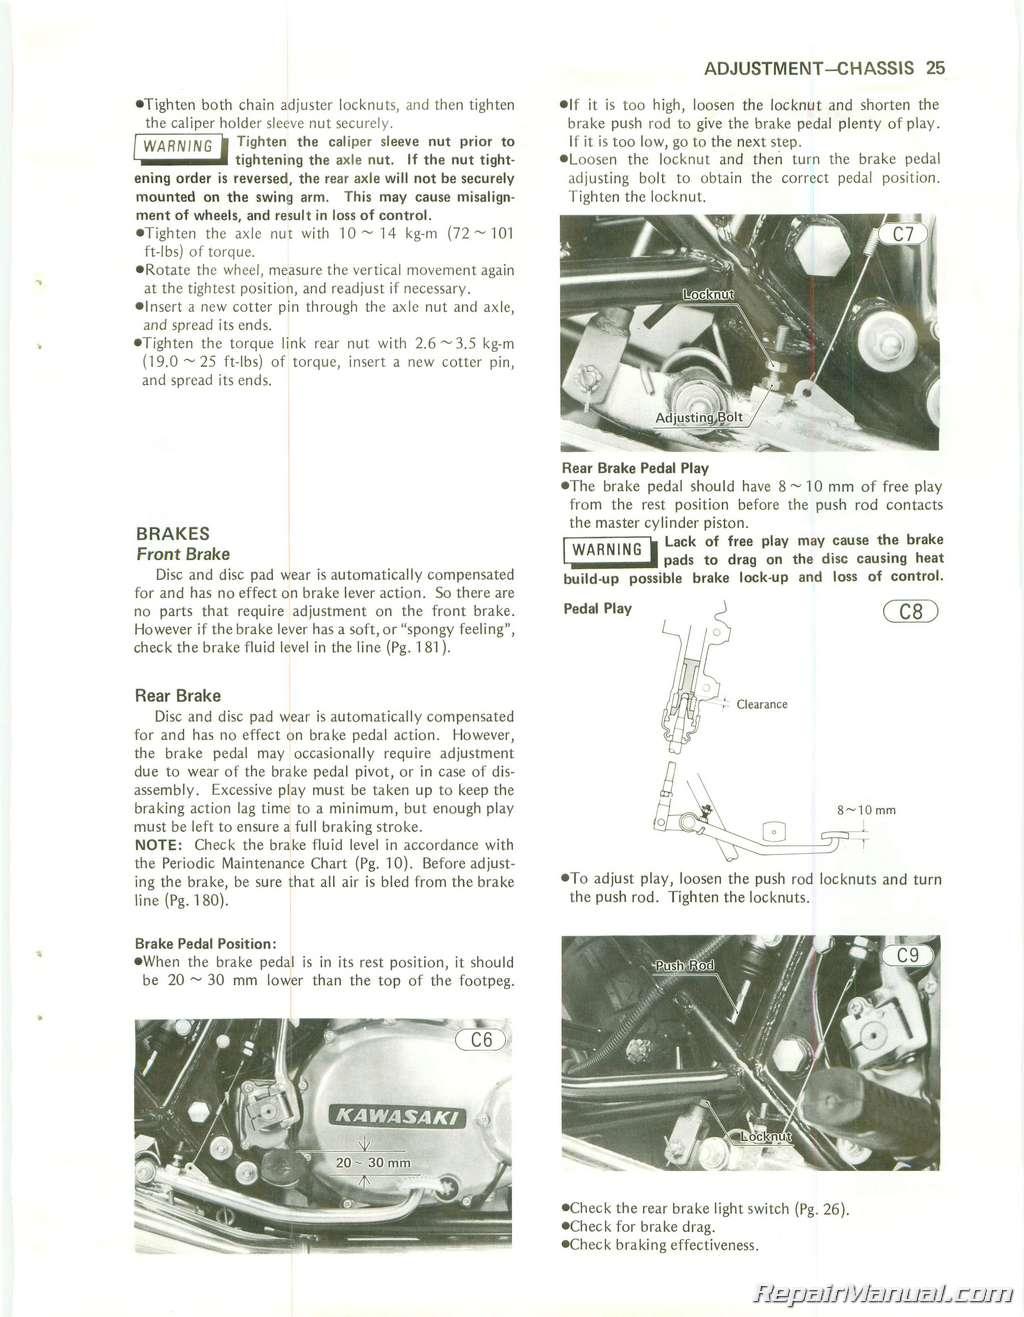 1980 Kz750 G1 Wiring Diagram Reinvent Your Kz900 1979 1984 Kawasaki Twin Cylinder Motorcycle Repair Manual Rh Repairmanual Com Xt225 Kz550